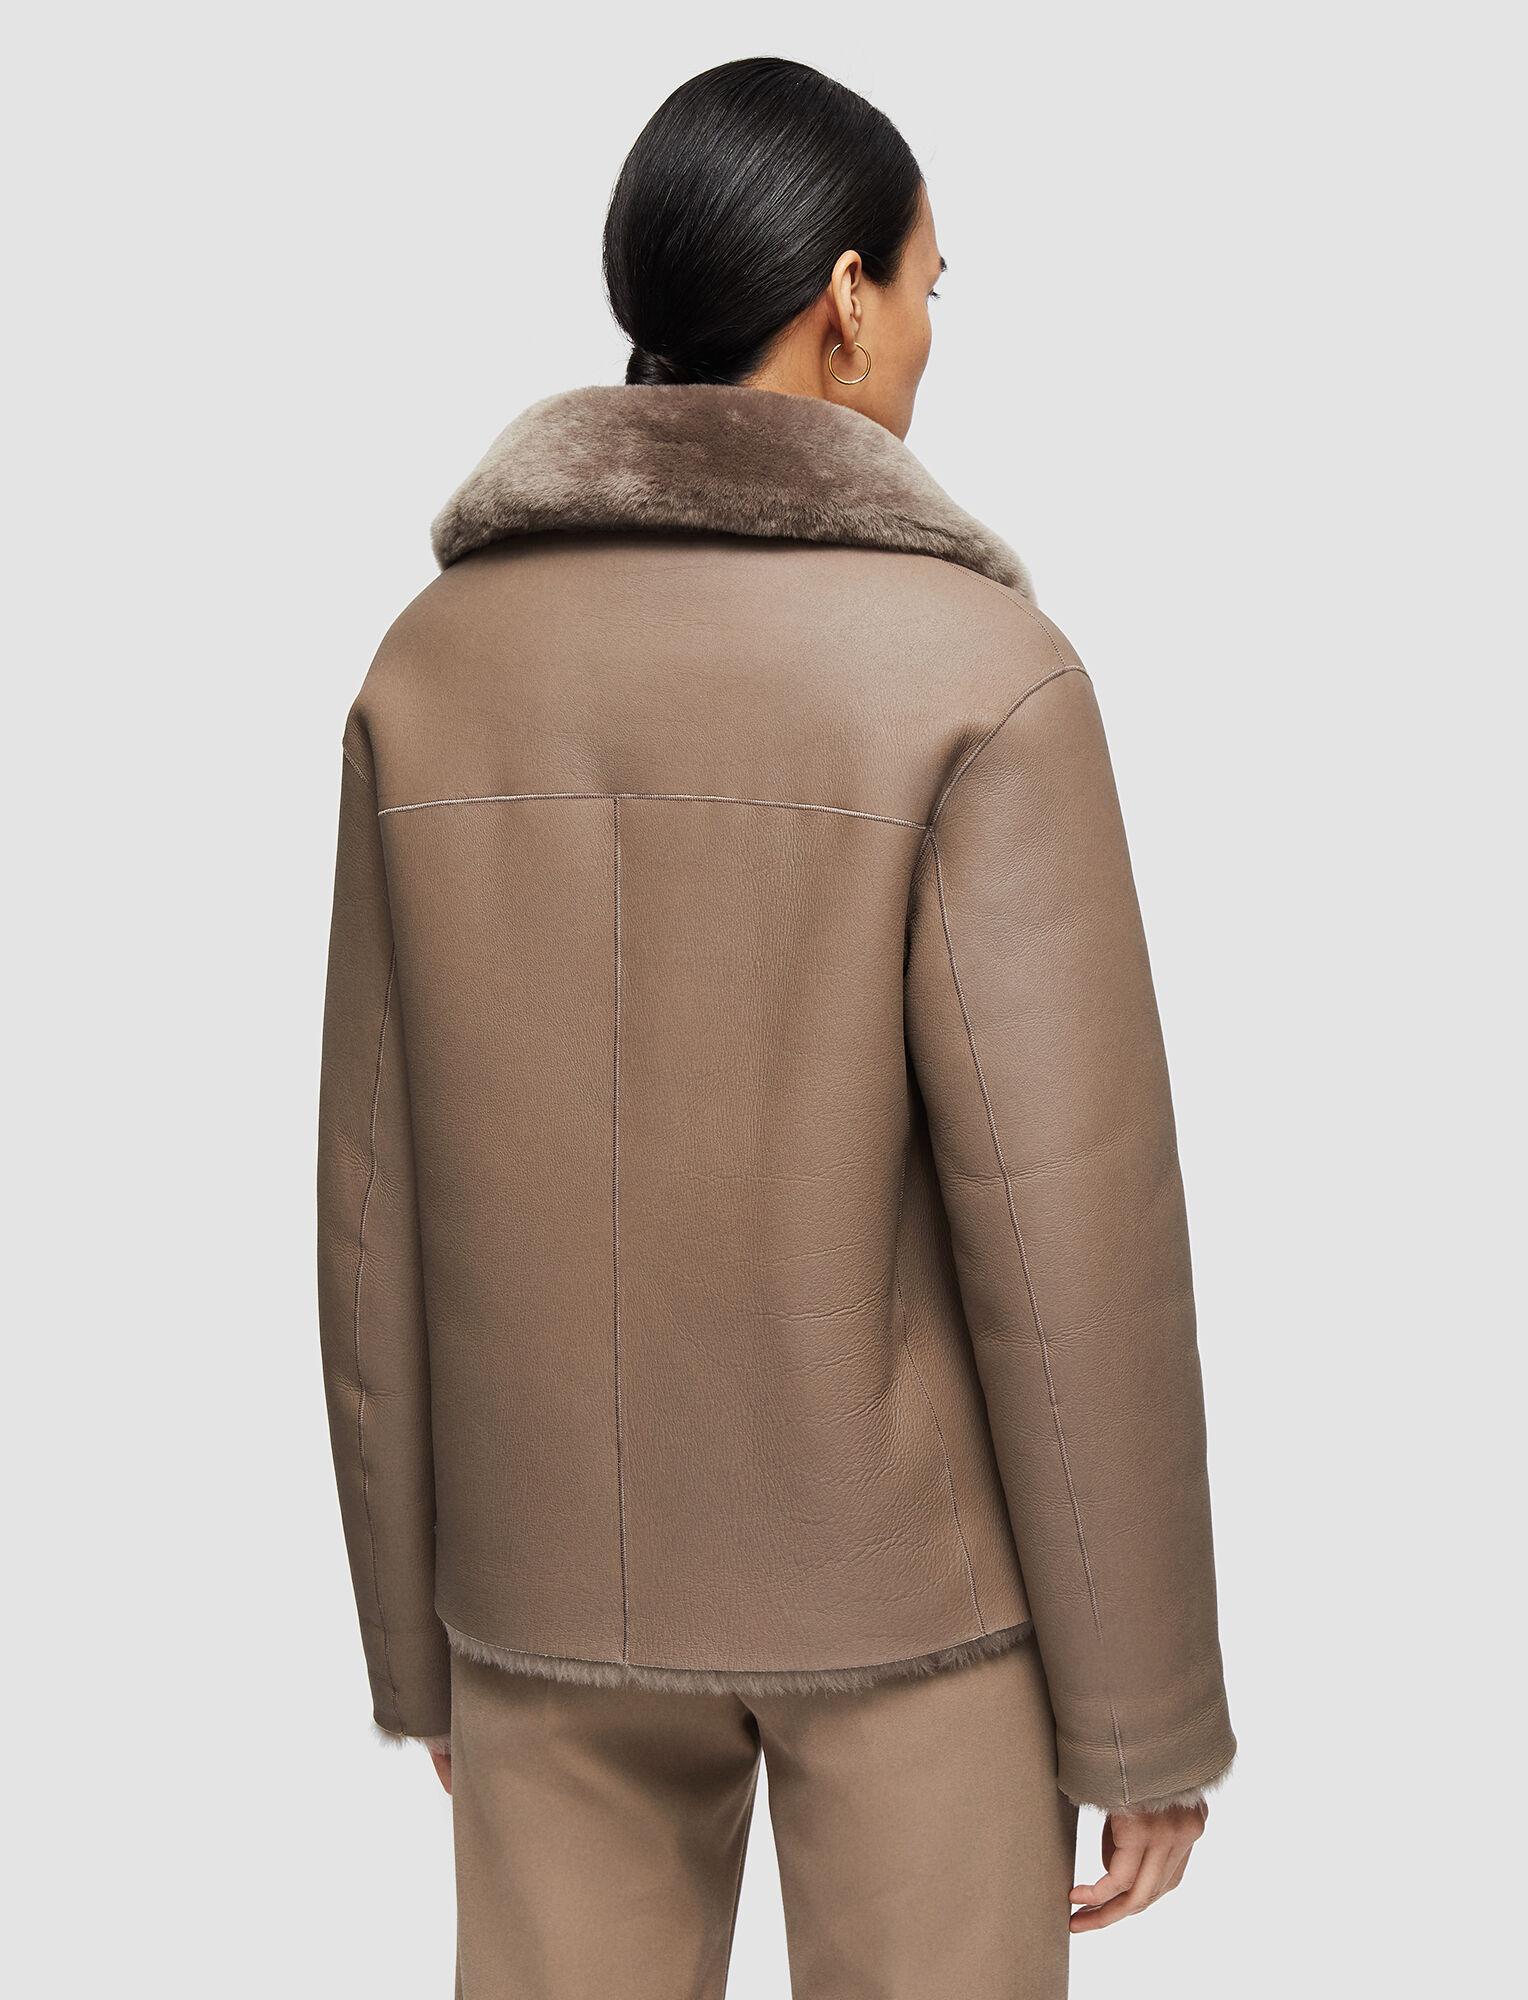 Joseph, Sheepskin Calla Coat, in TAUPE